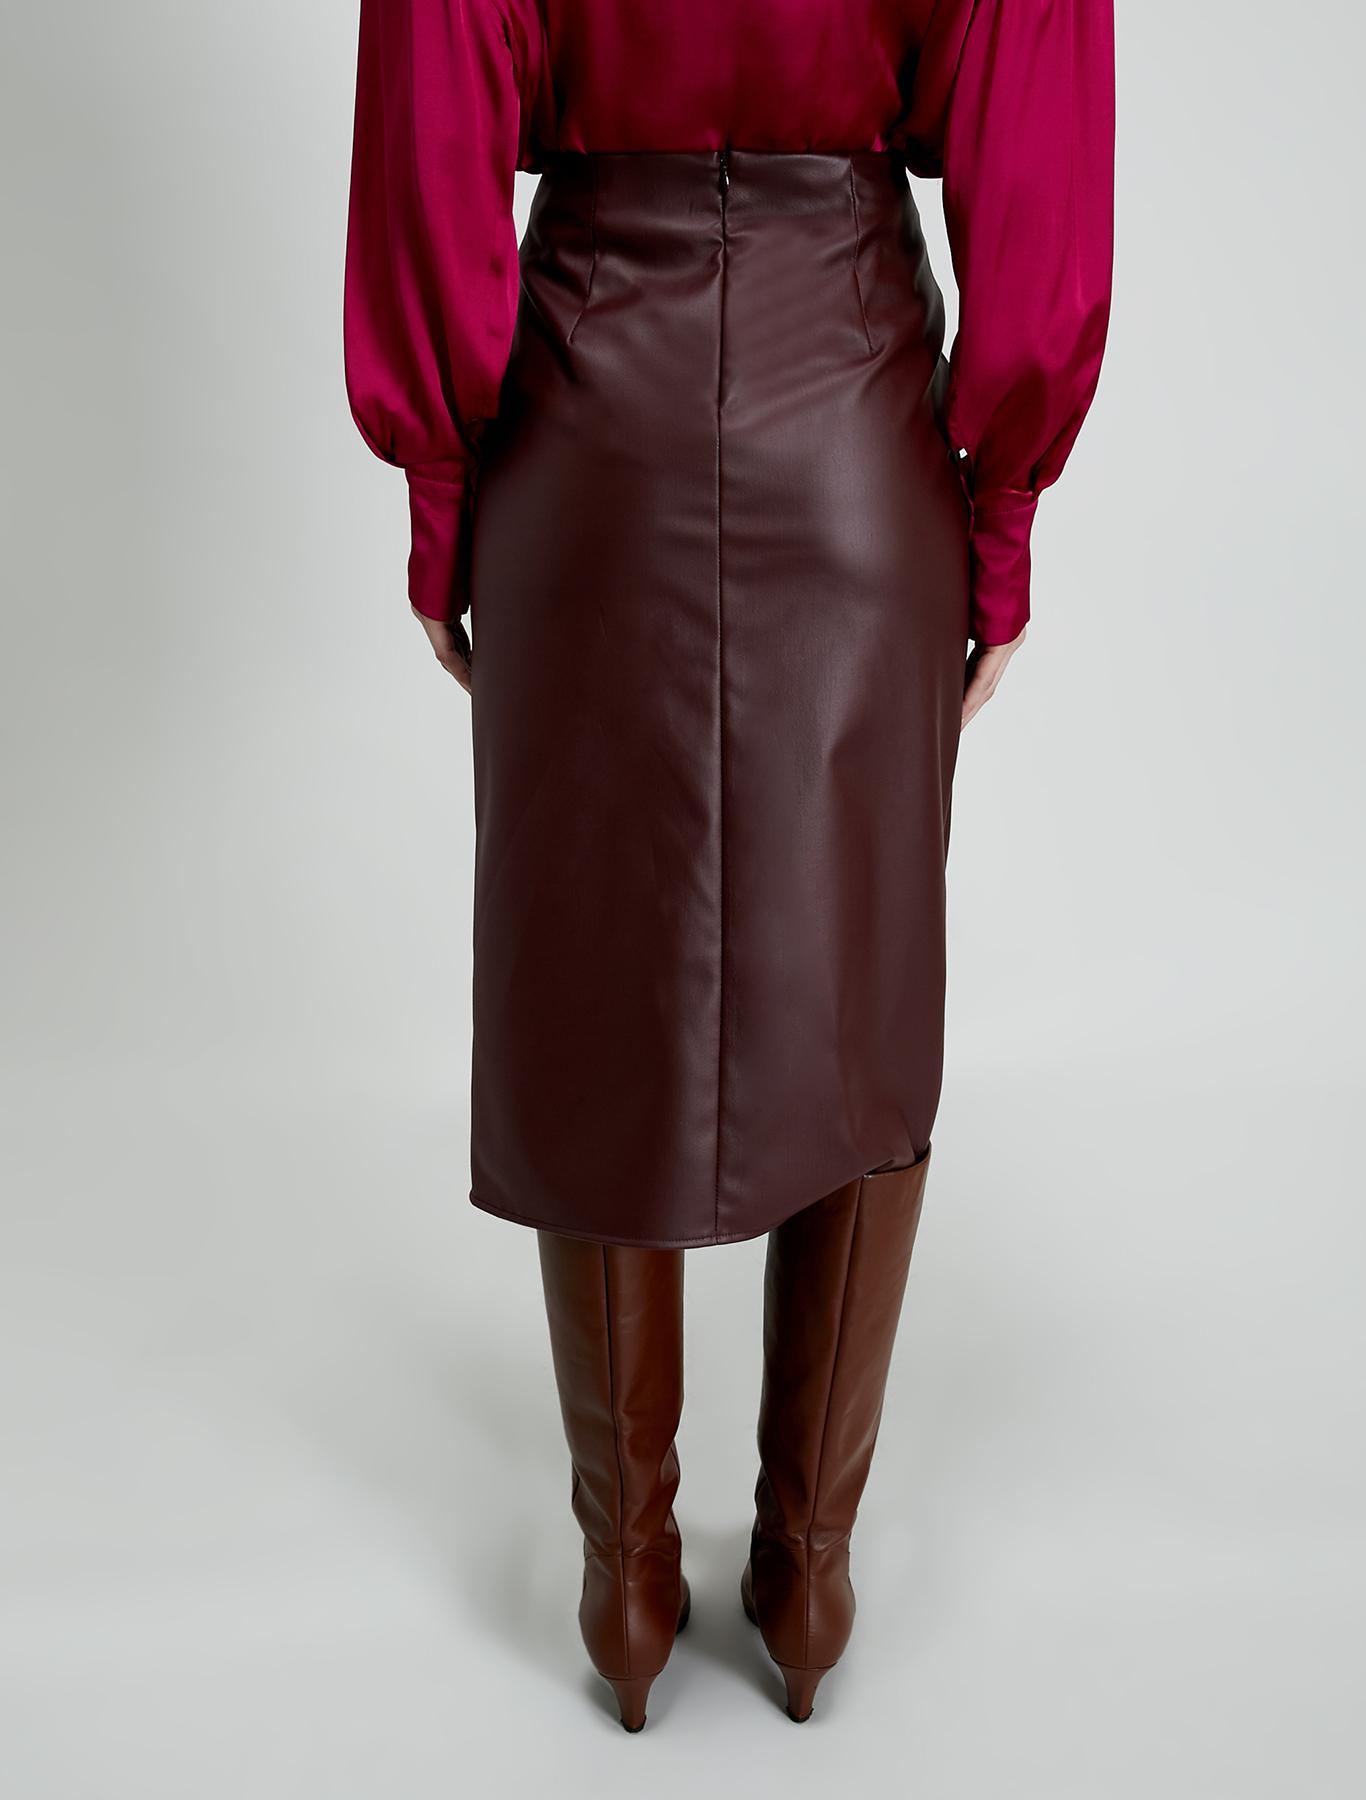 Coated jersey pencil skirt - burgundy - pennyblack